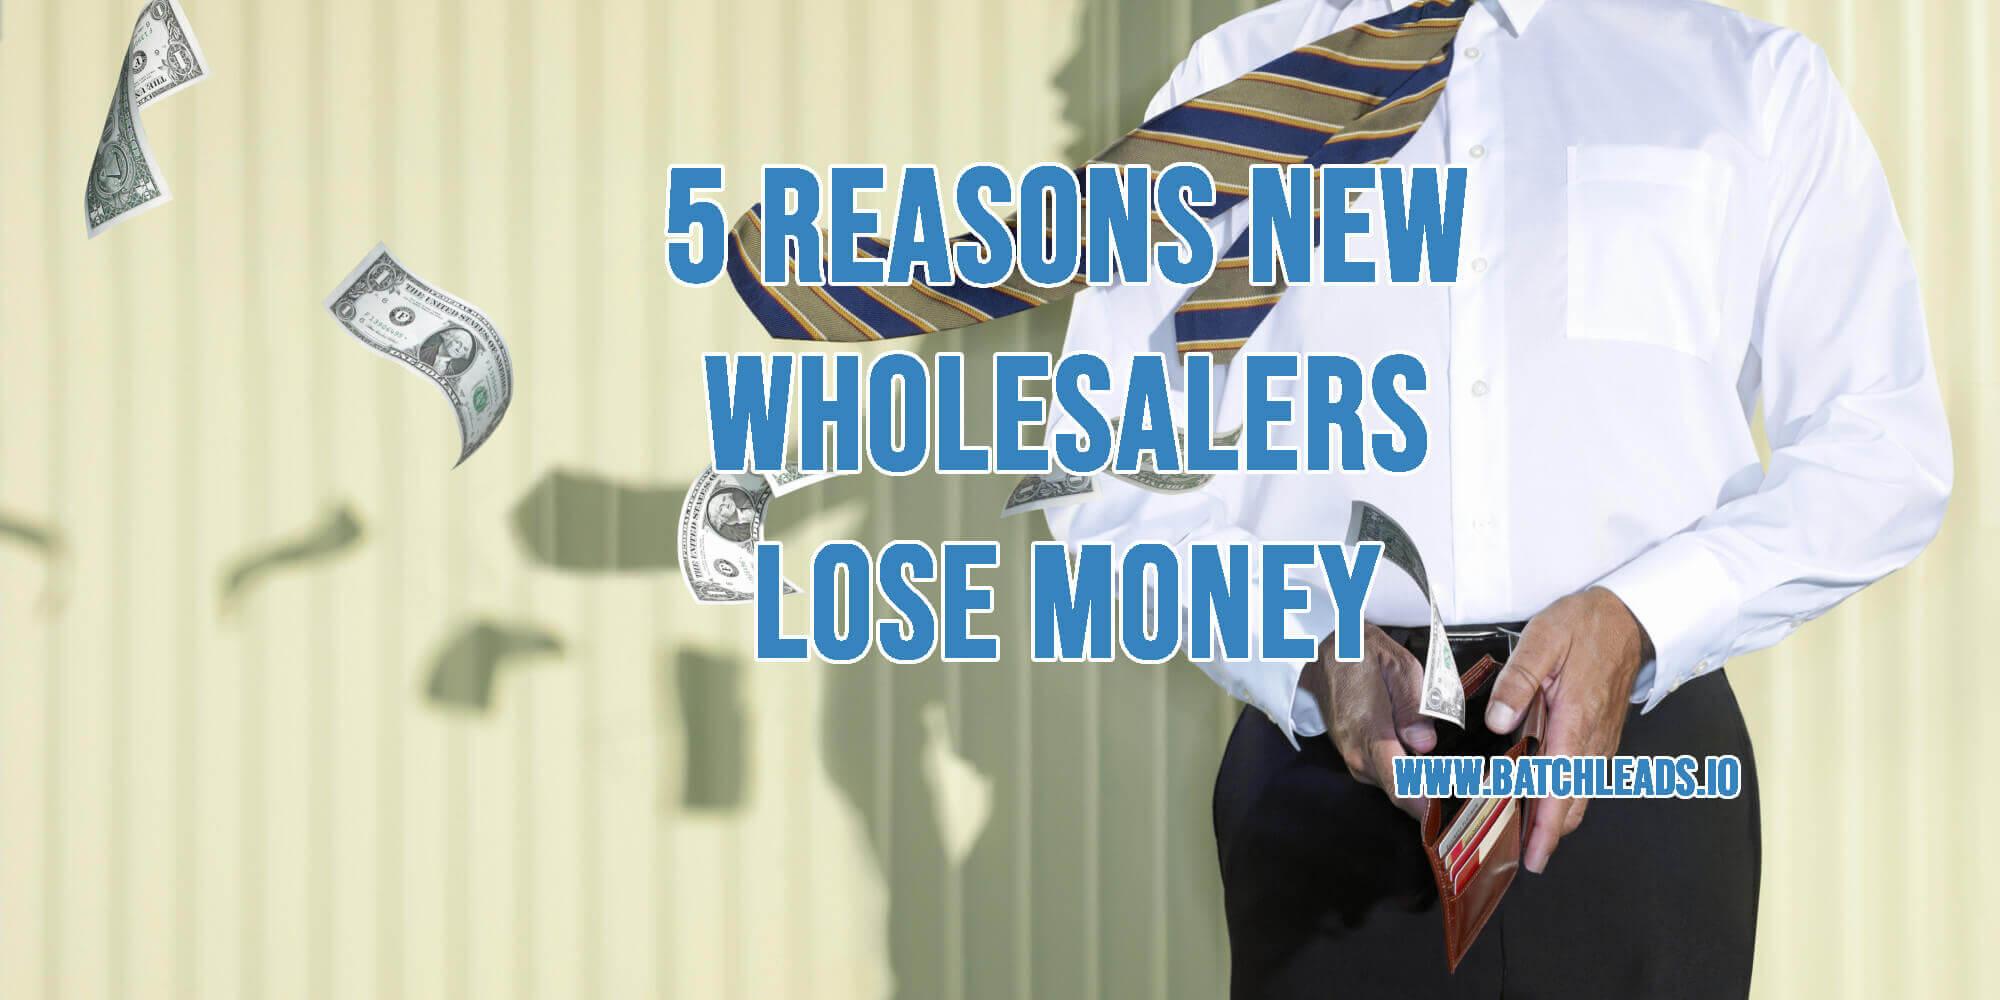 5 Reasons New Wholesalers Lose Money